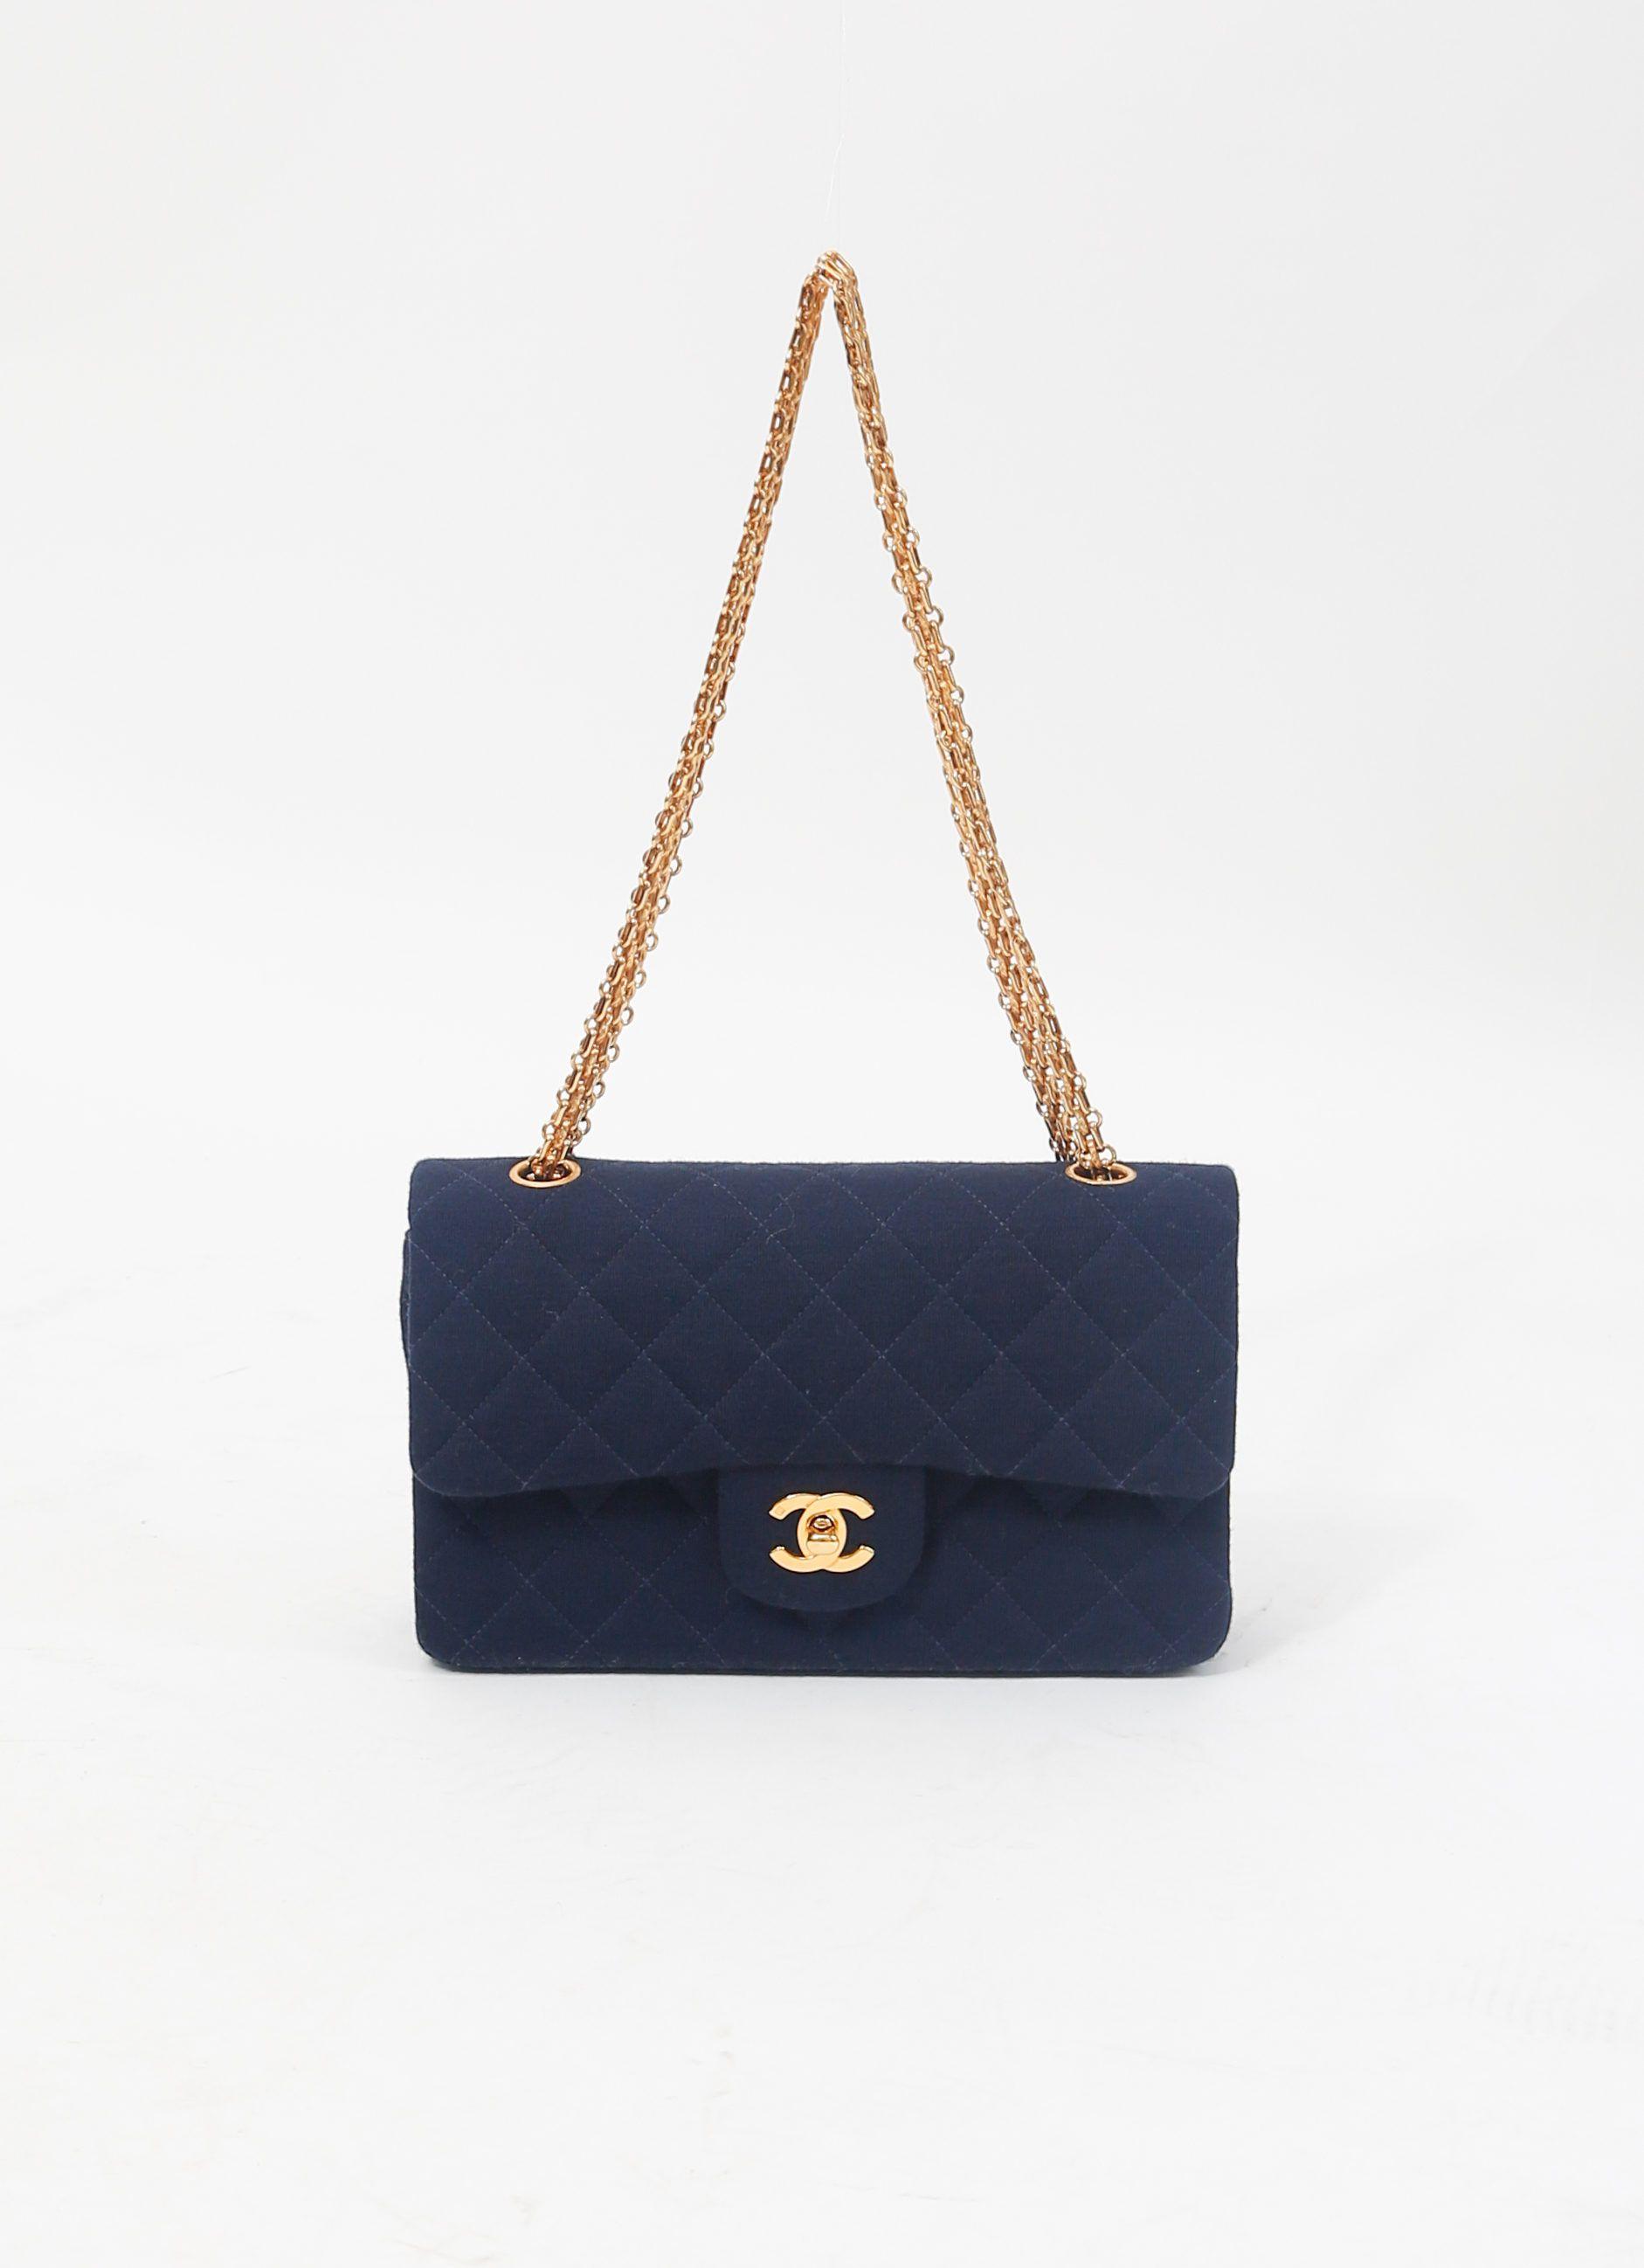 Chanel Vintage Jersey Bag | Order now on RESEE.com